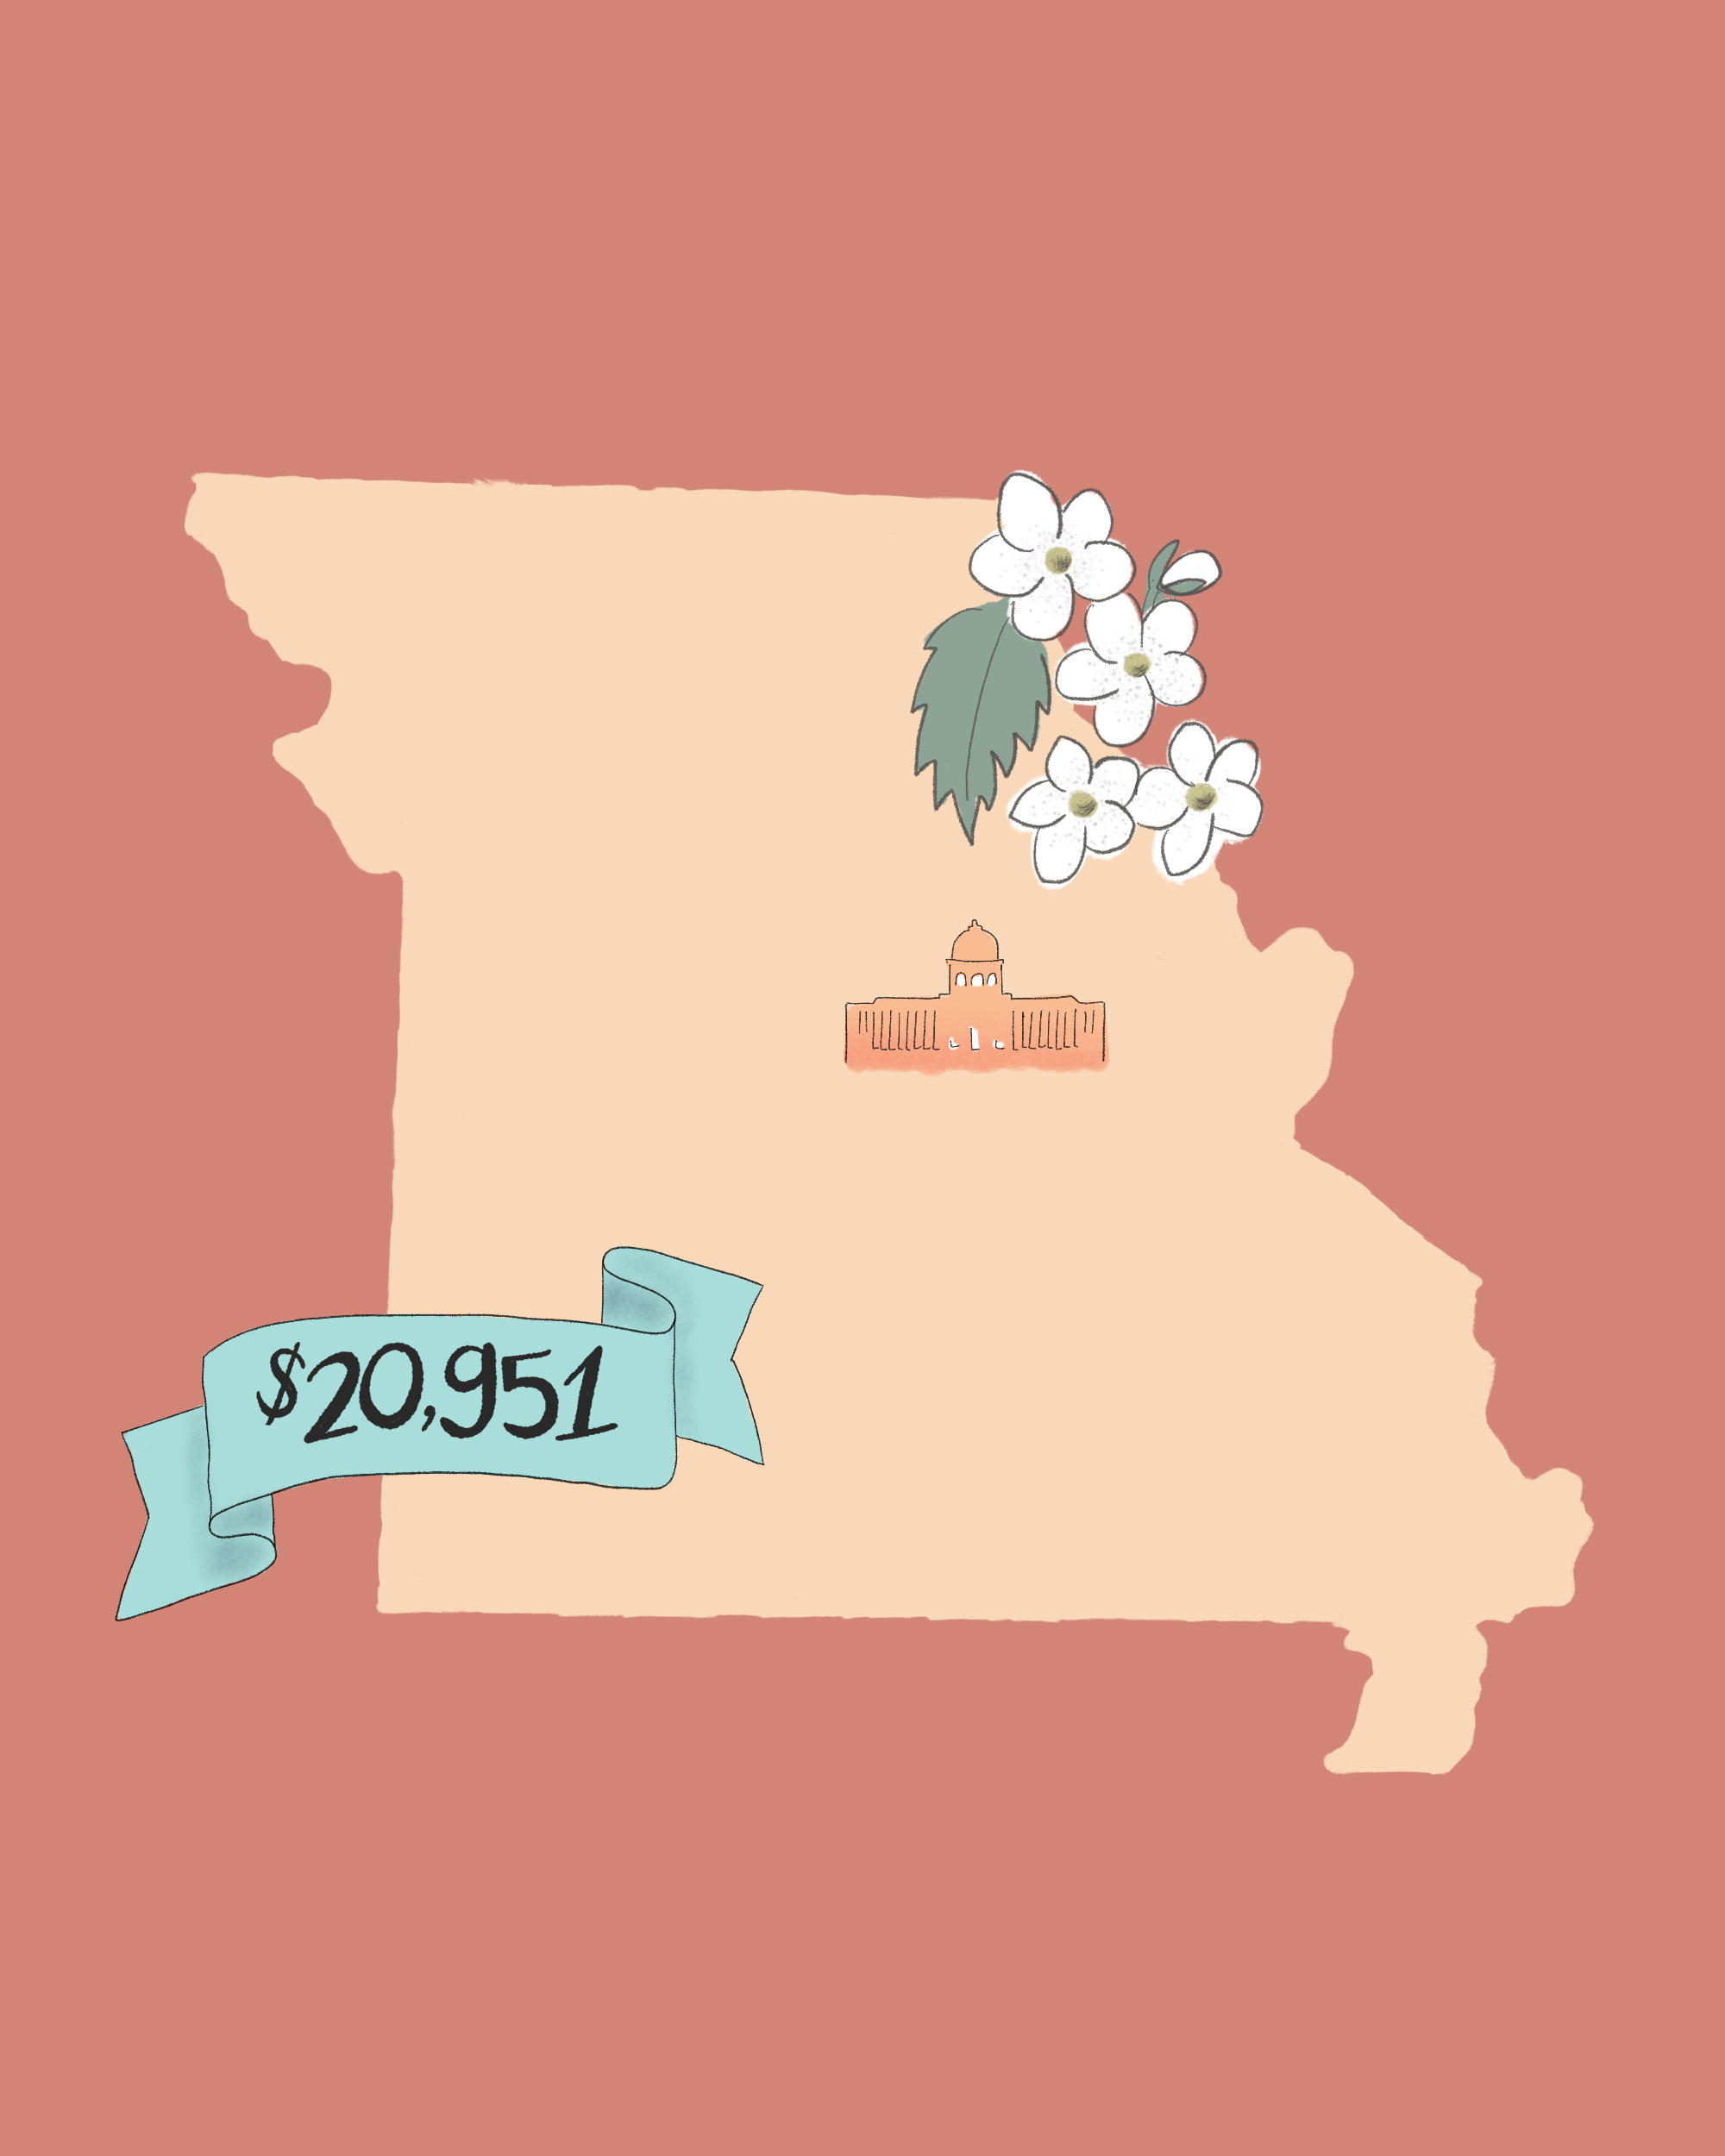 state wedding costs illustration missouri